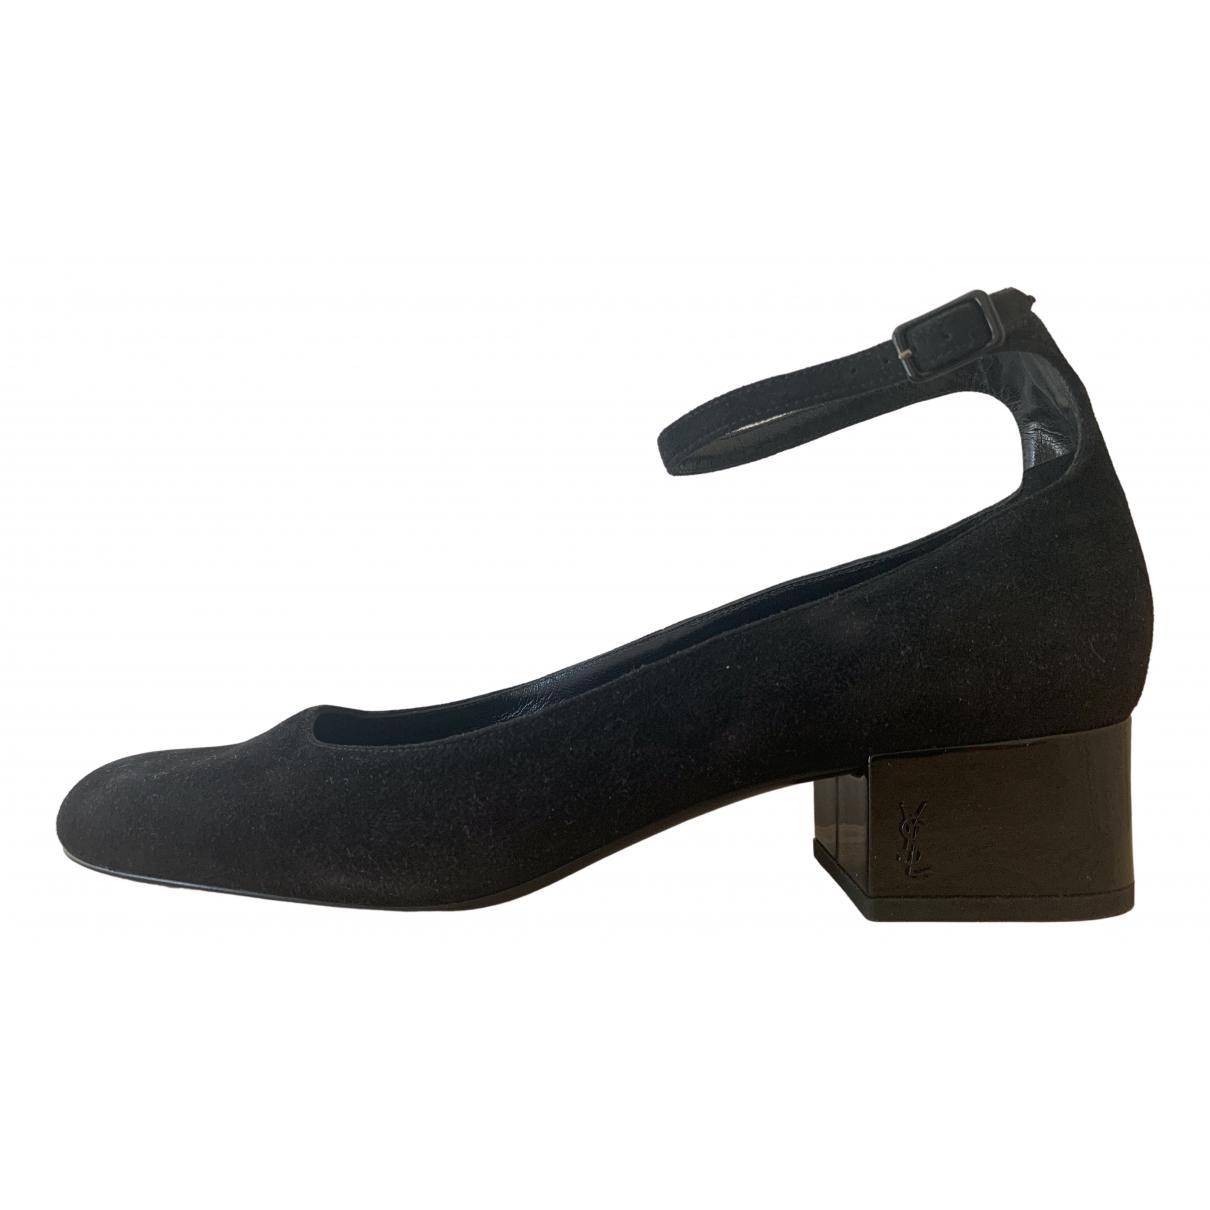 Saint Laurent \N Black Patent leather Heels for Women 40 EU